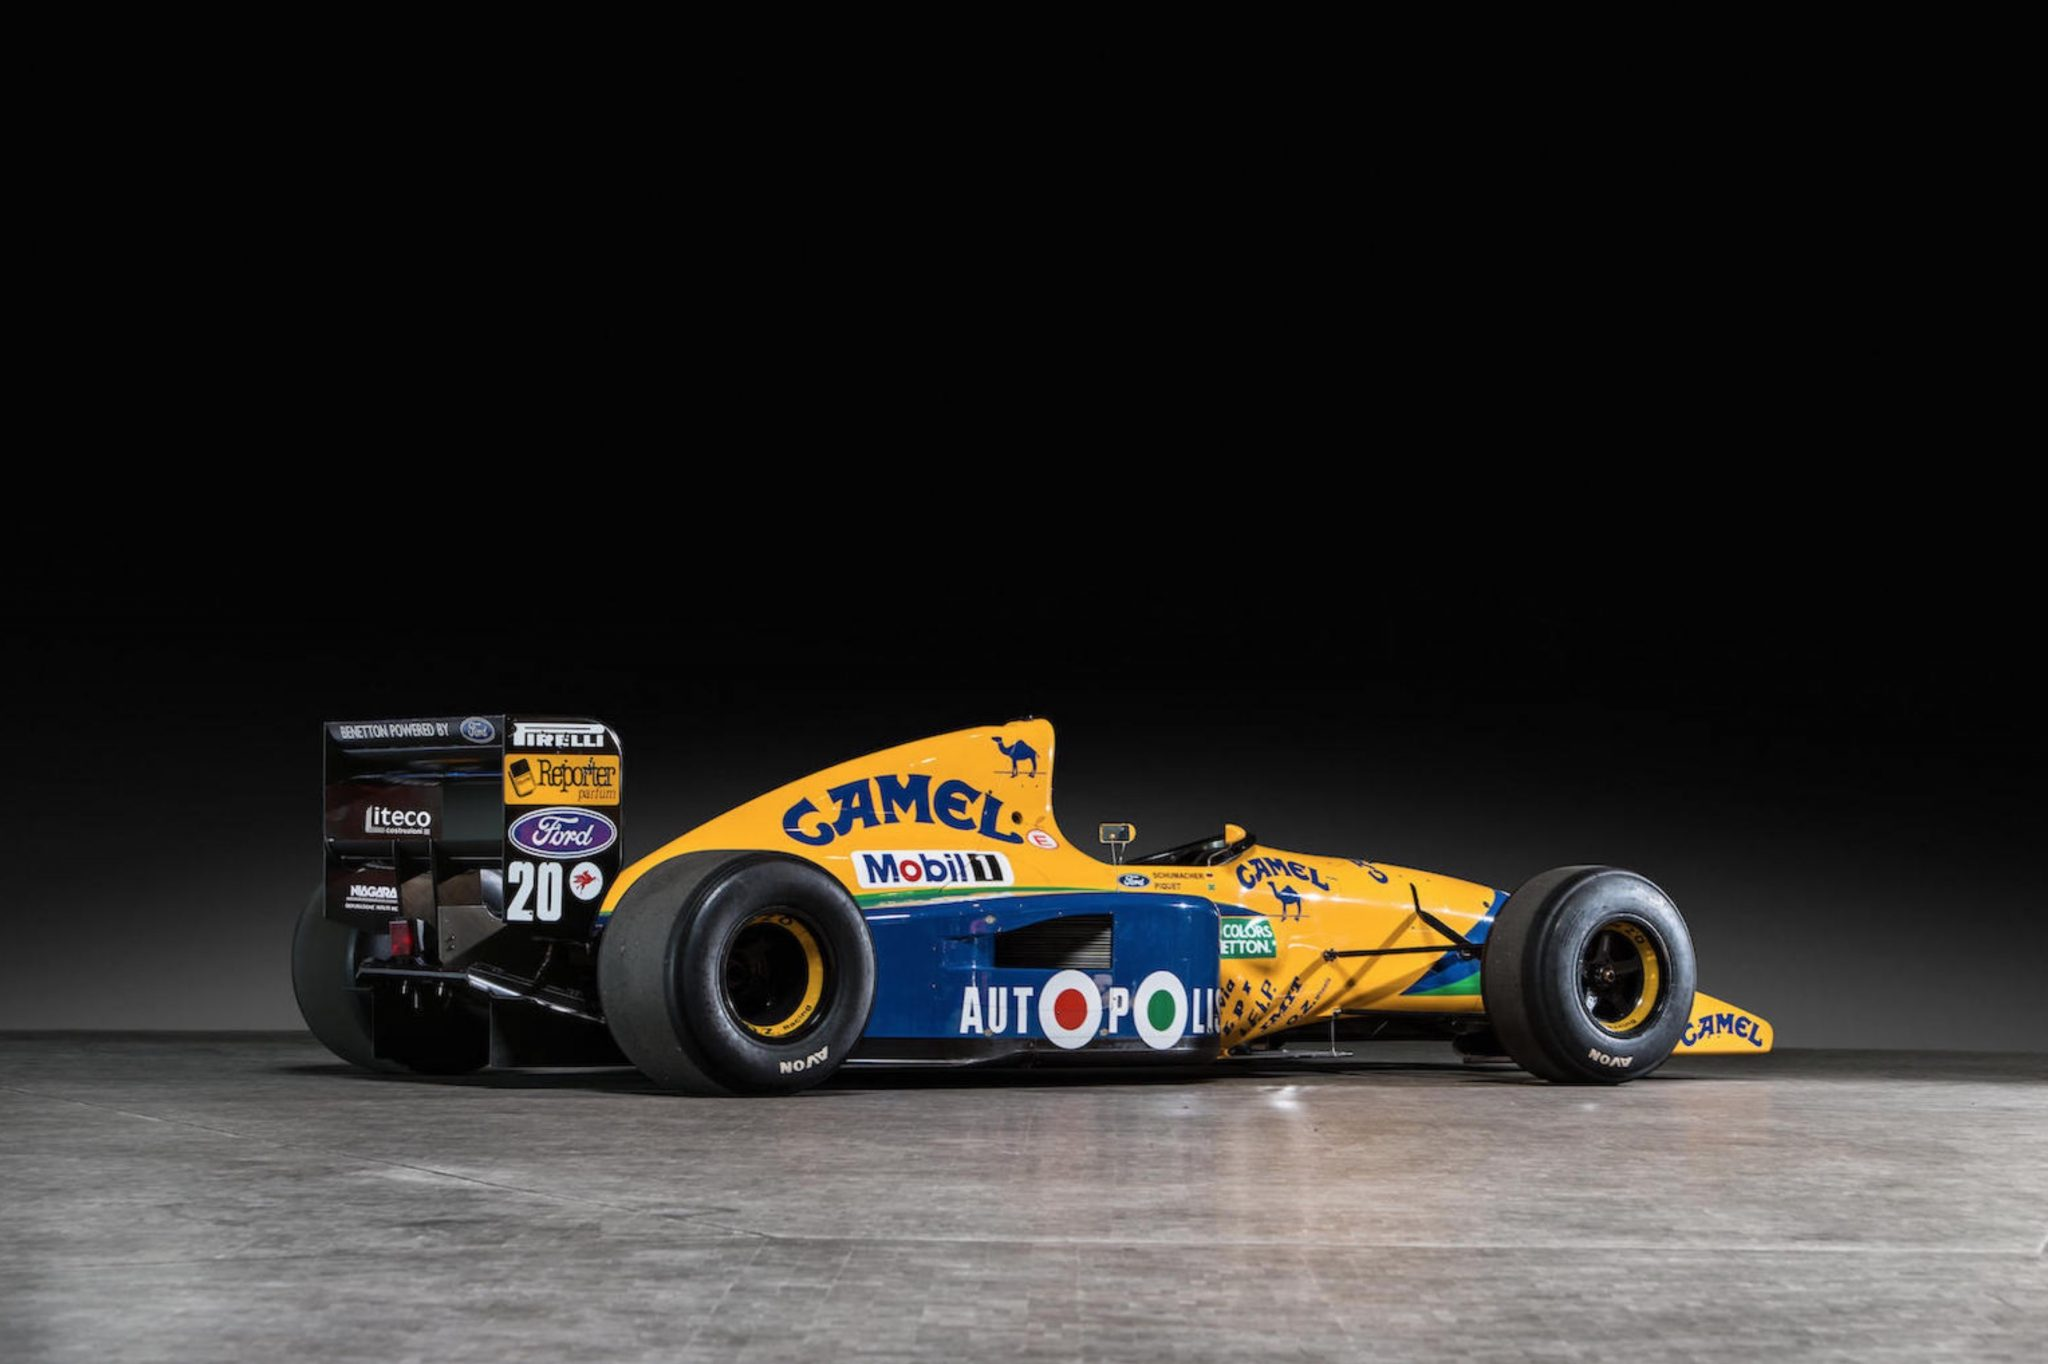 F1: Ex-Michael Schumacher 1991 Benetton F1 Car